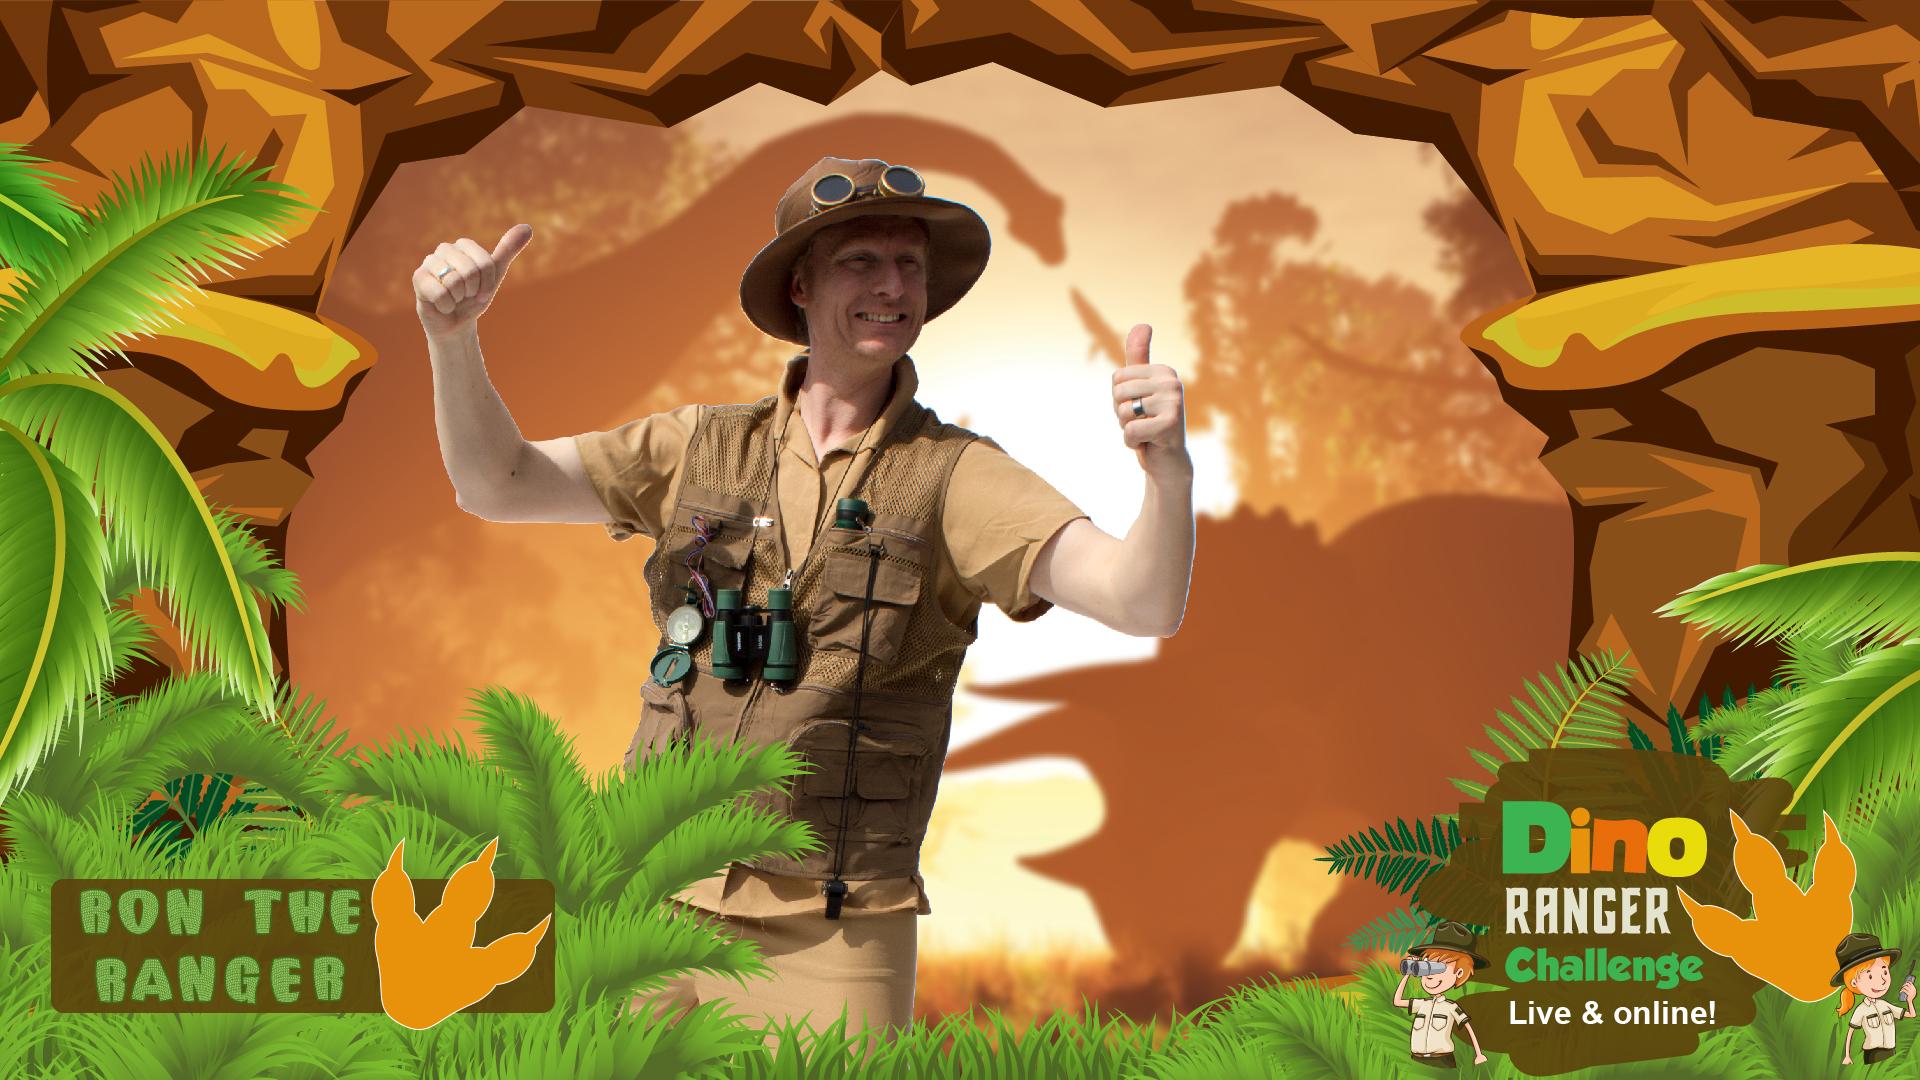 dino ranger challenge live online event for kids